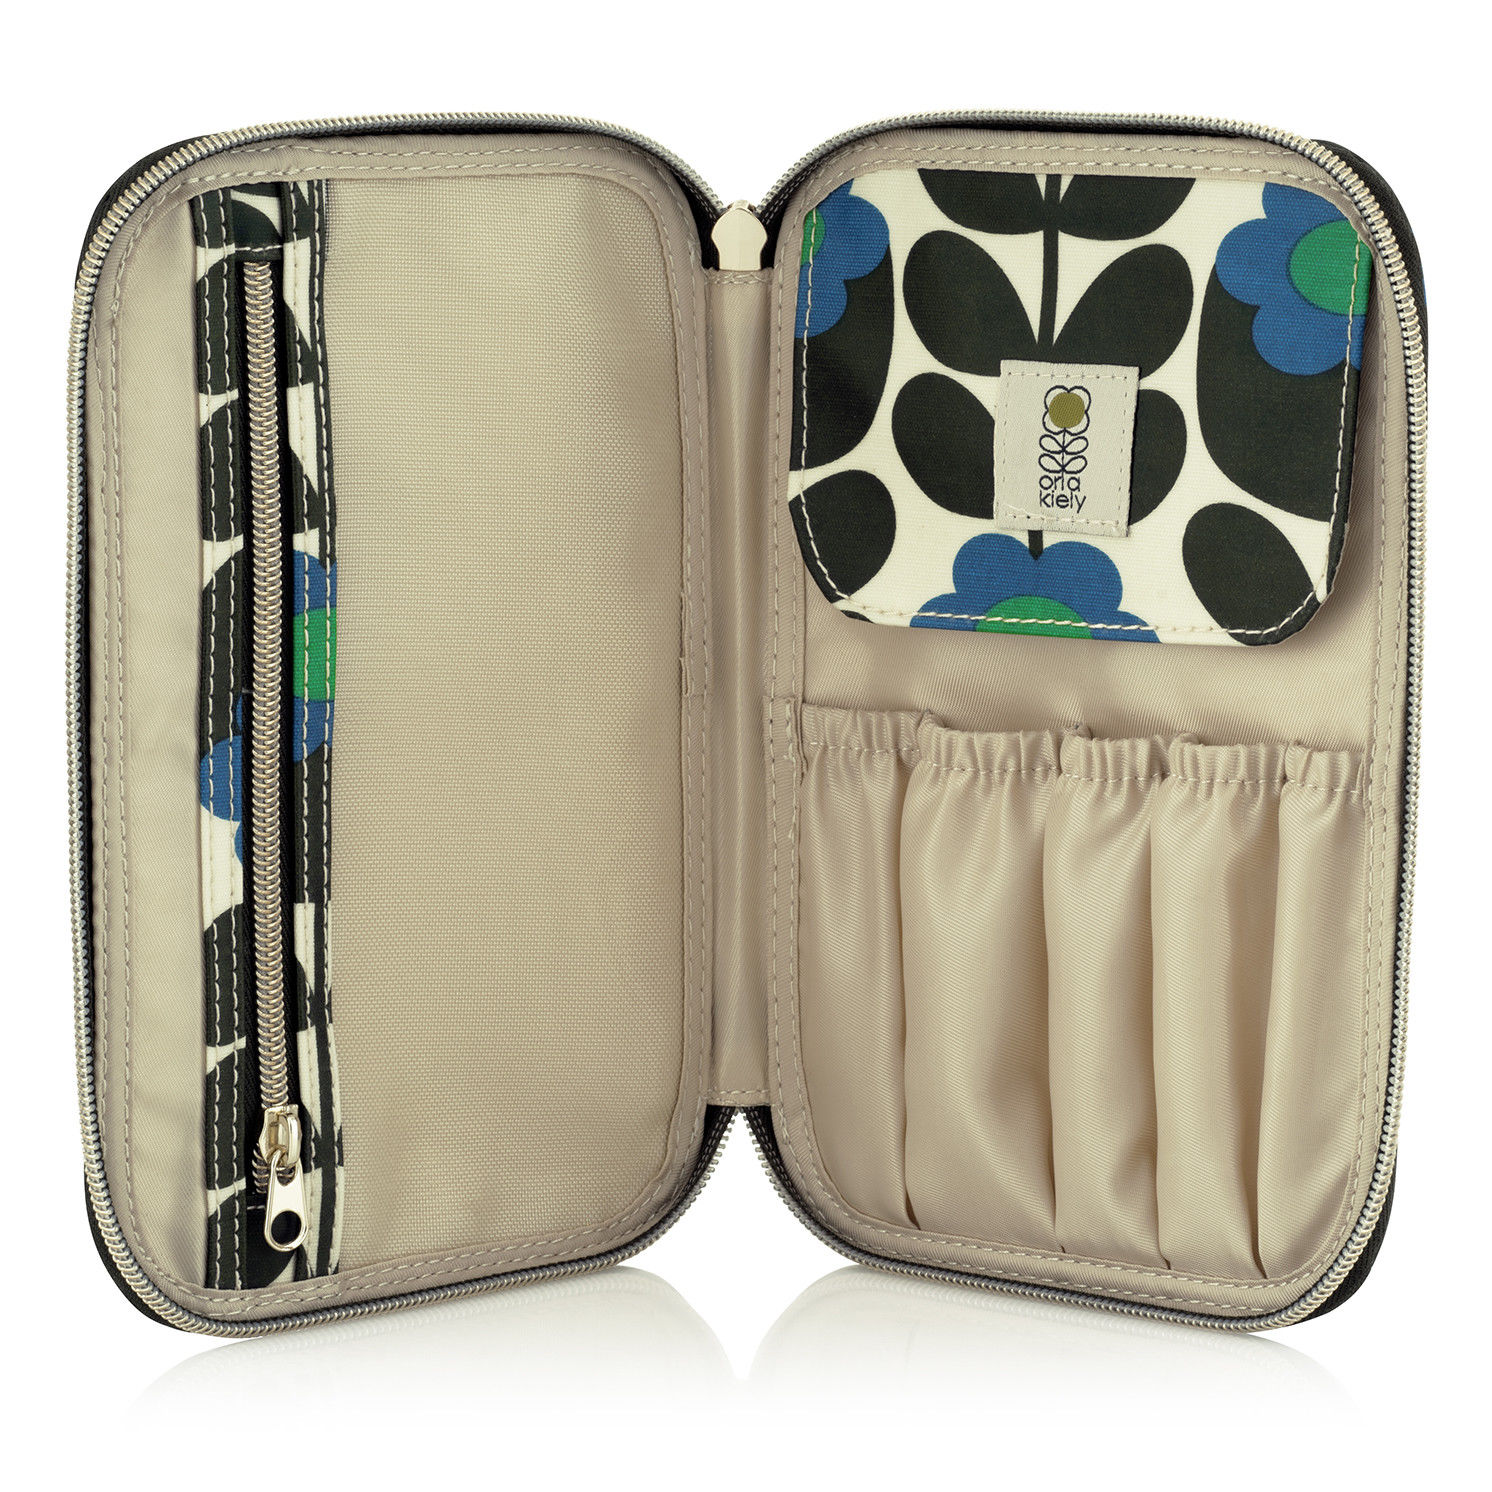 Orla Kiely – Primrose Collection Cosmetic Brush Case